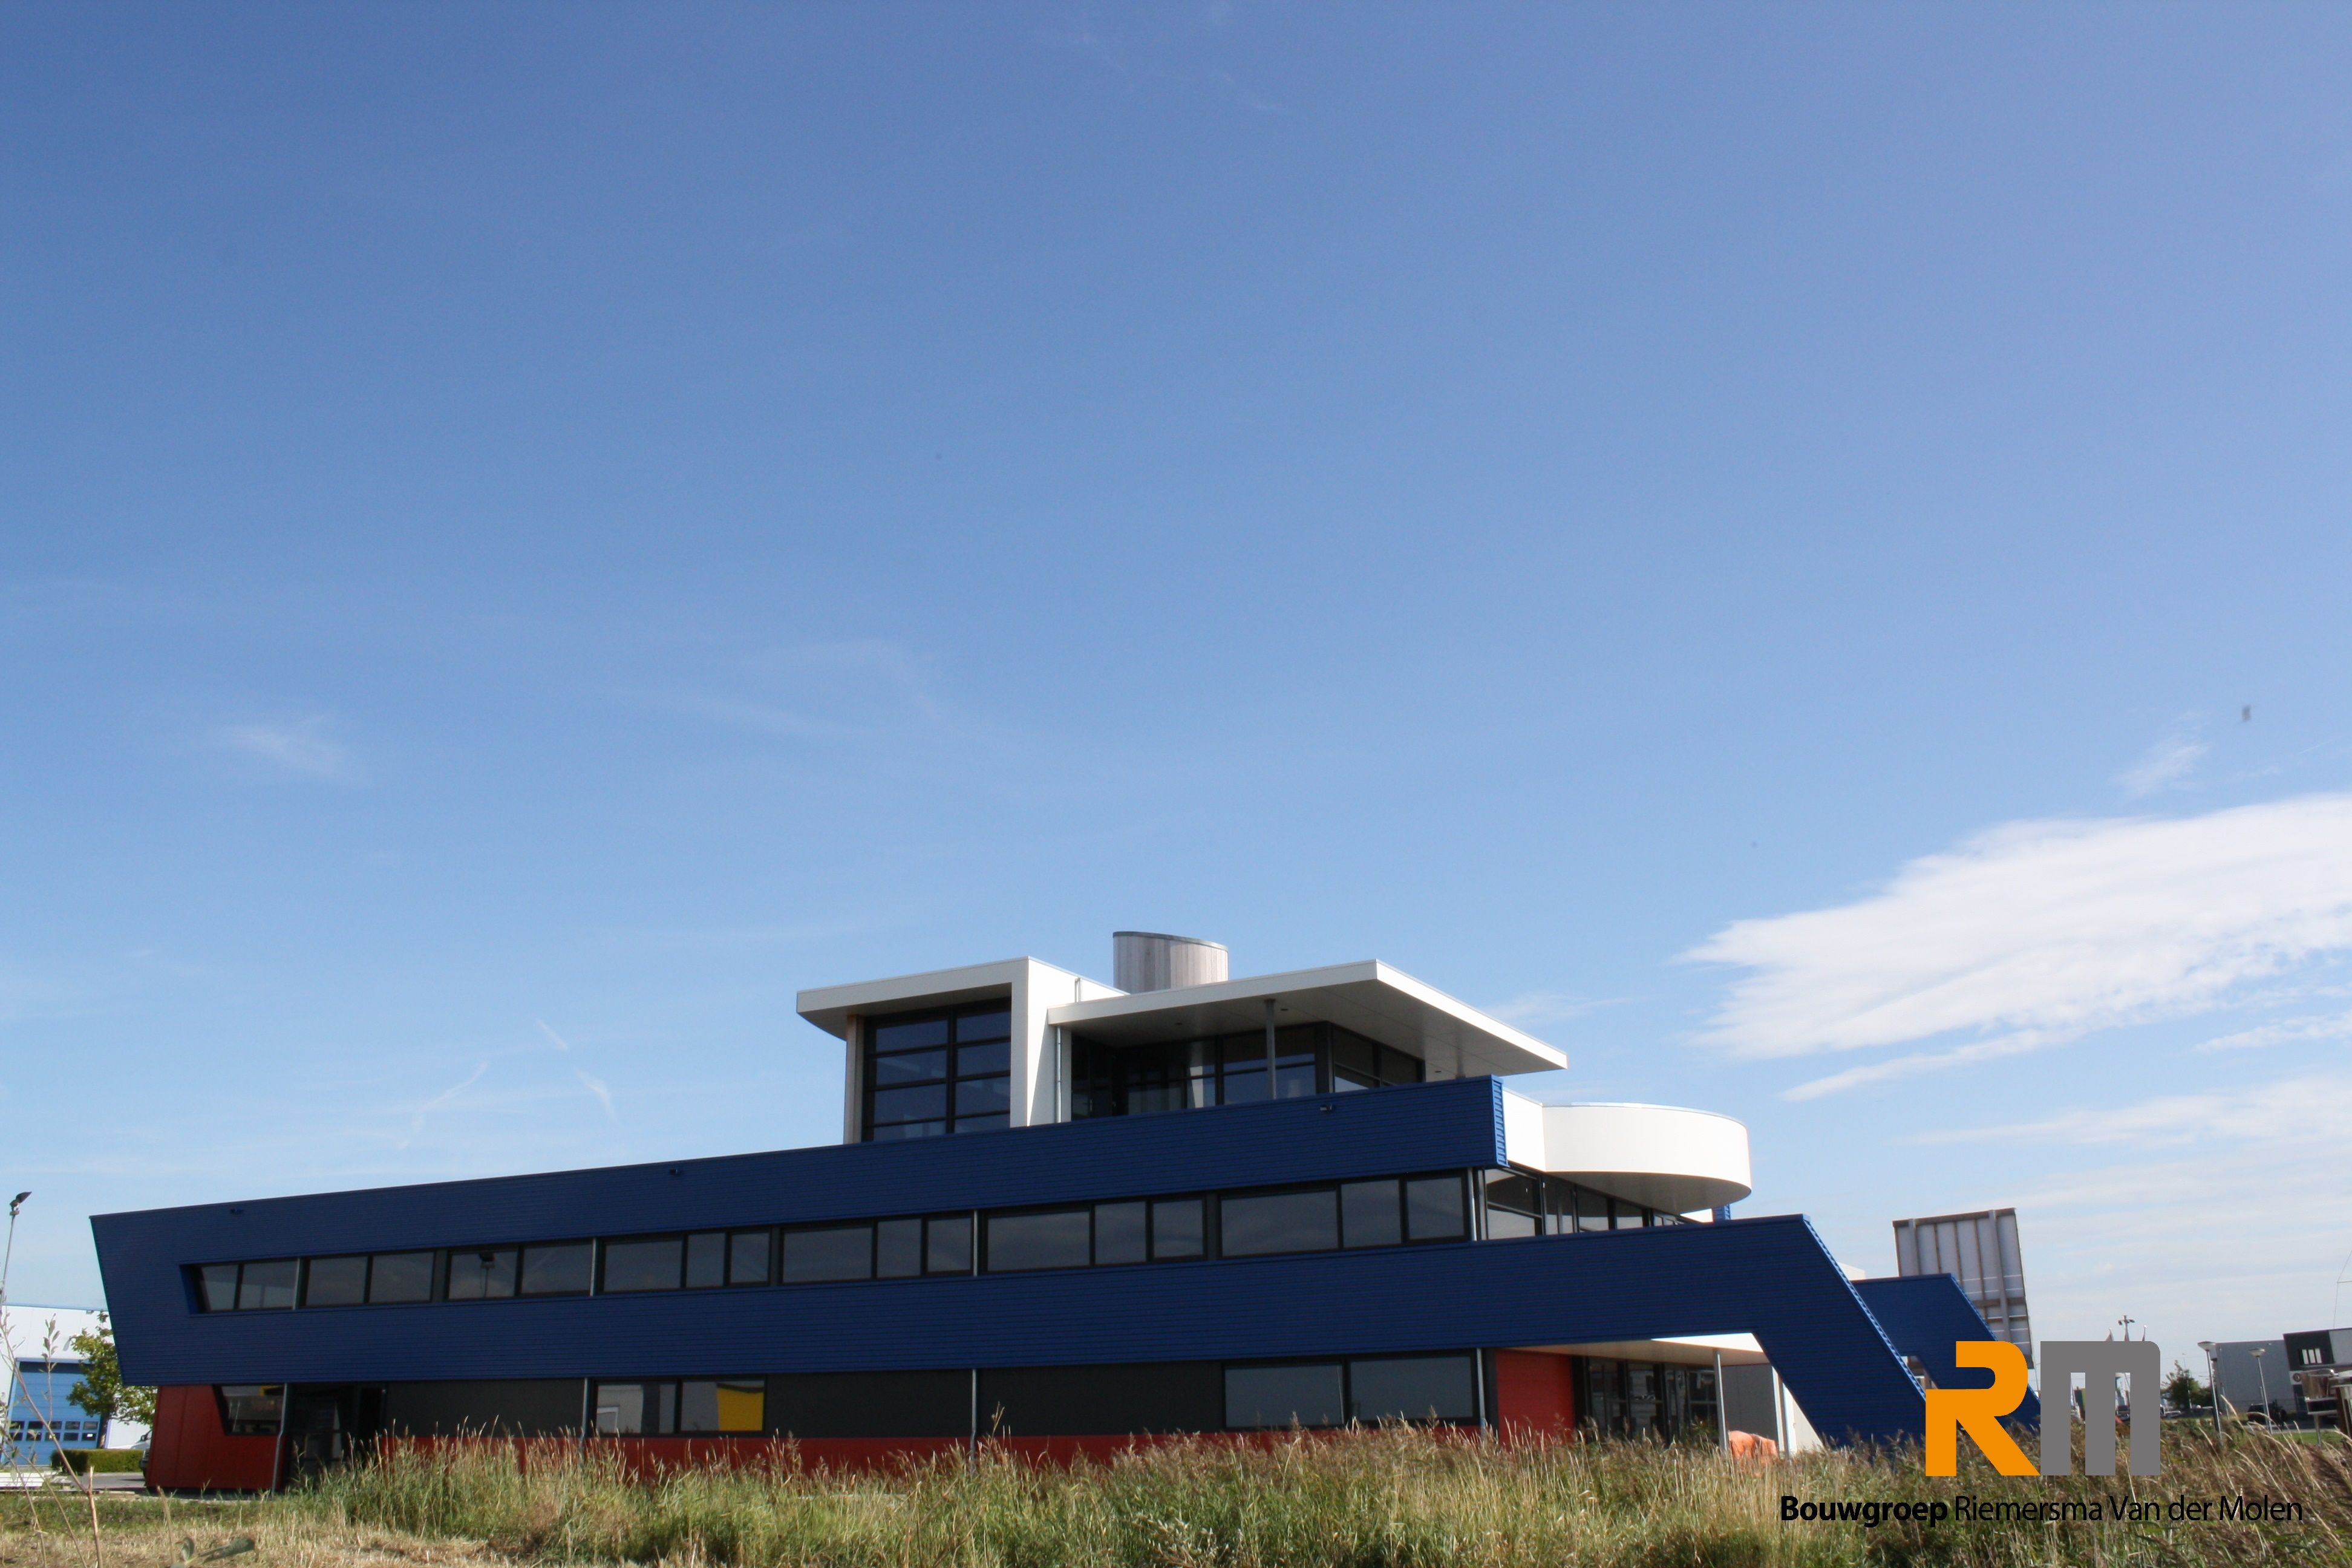 Tristar shipping, Locatie: Bakboord 5, Drachten